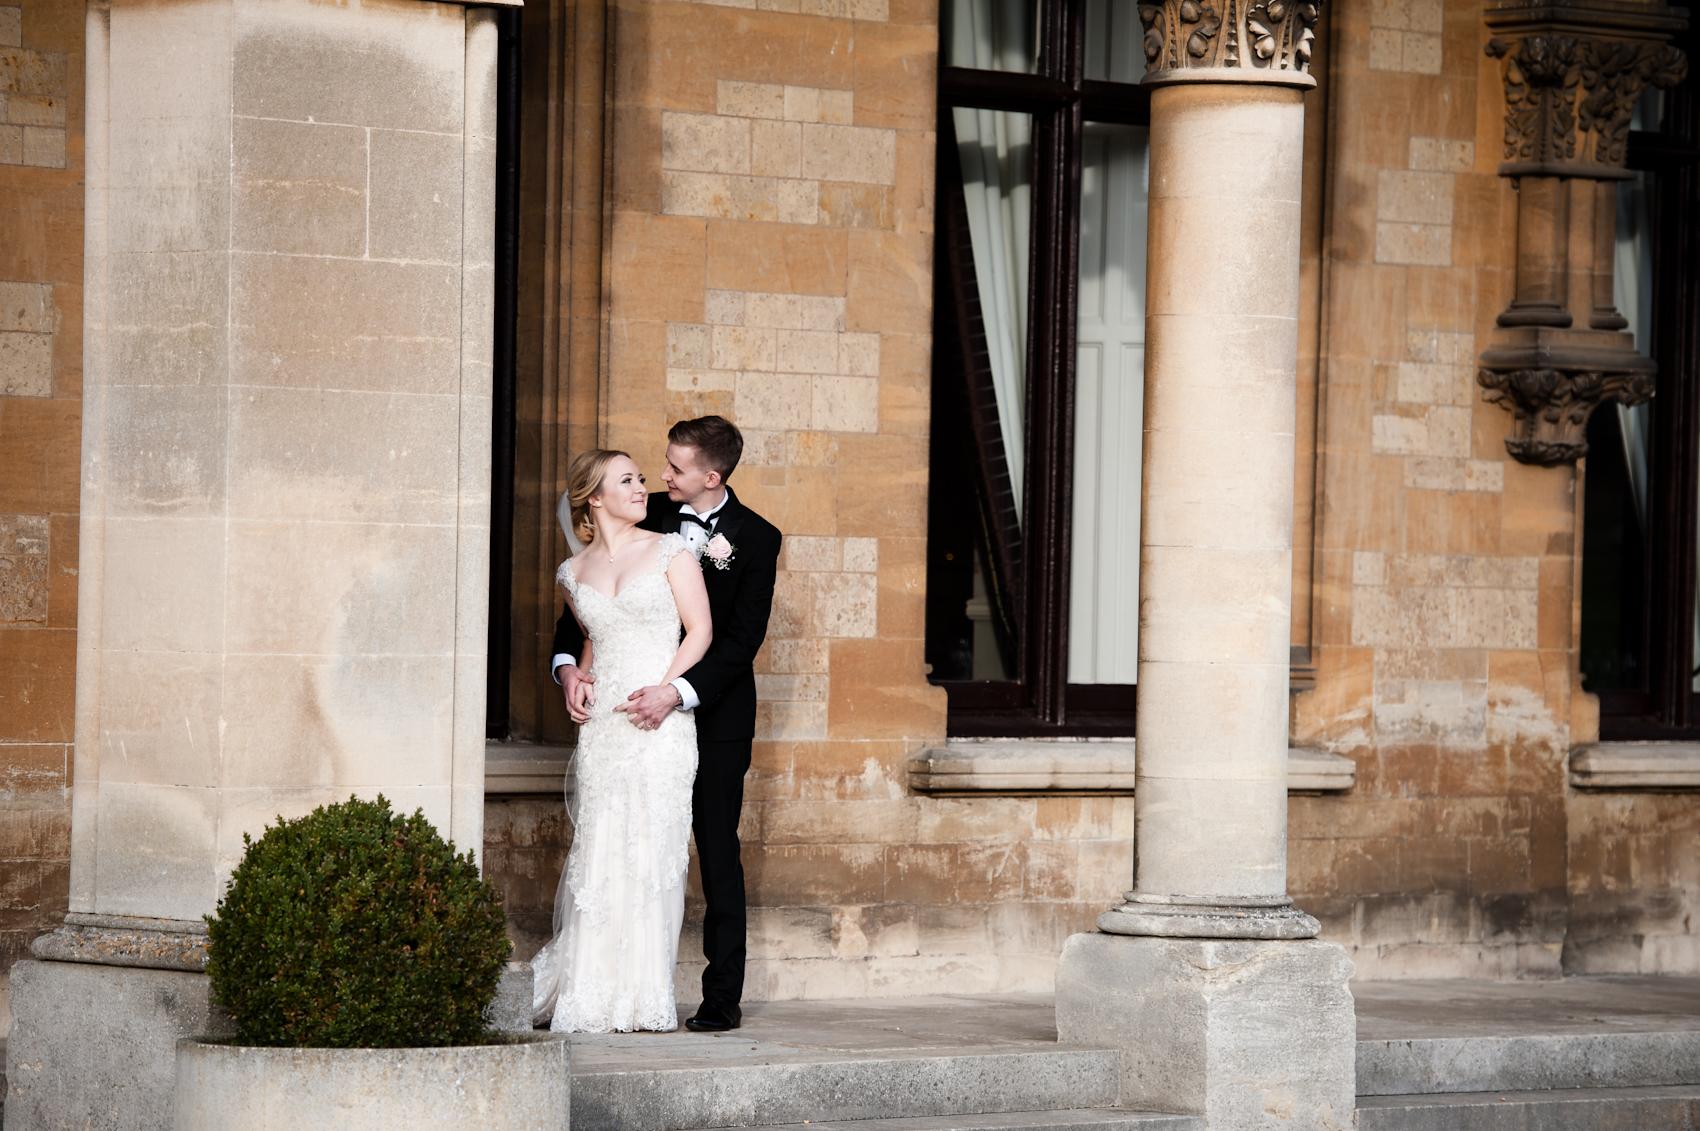 Declan & Emma wedding (14 of 29).jpg